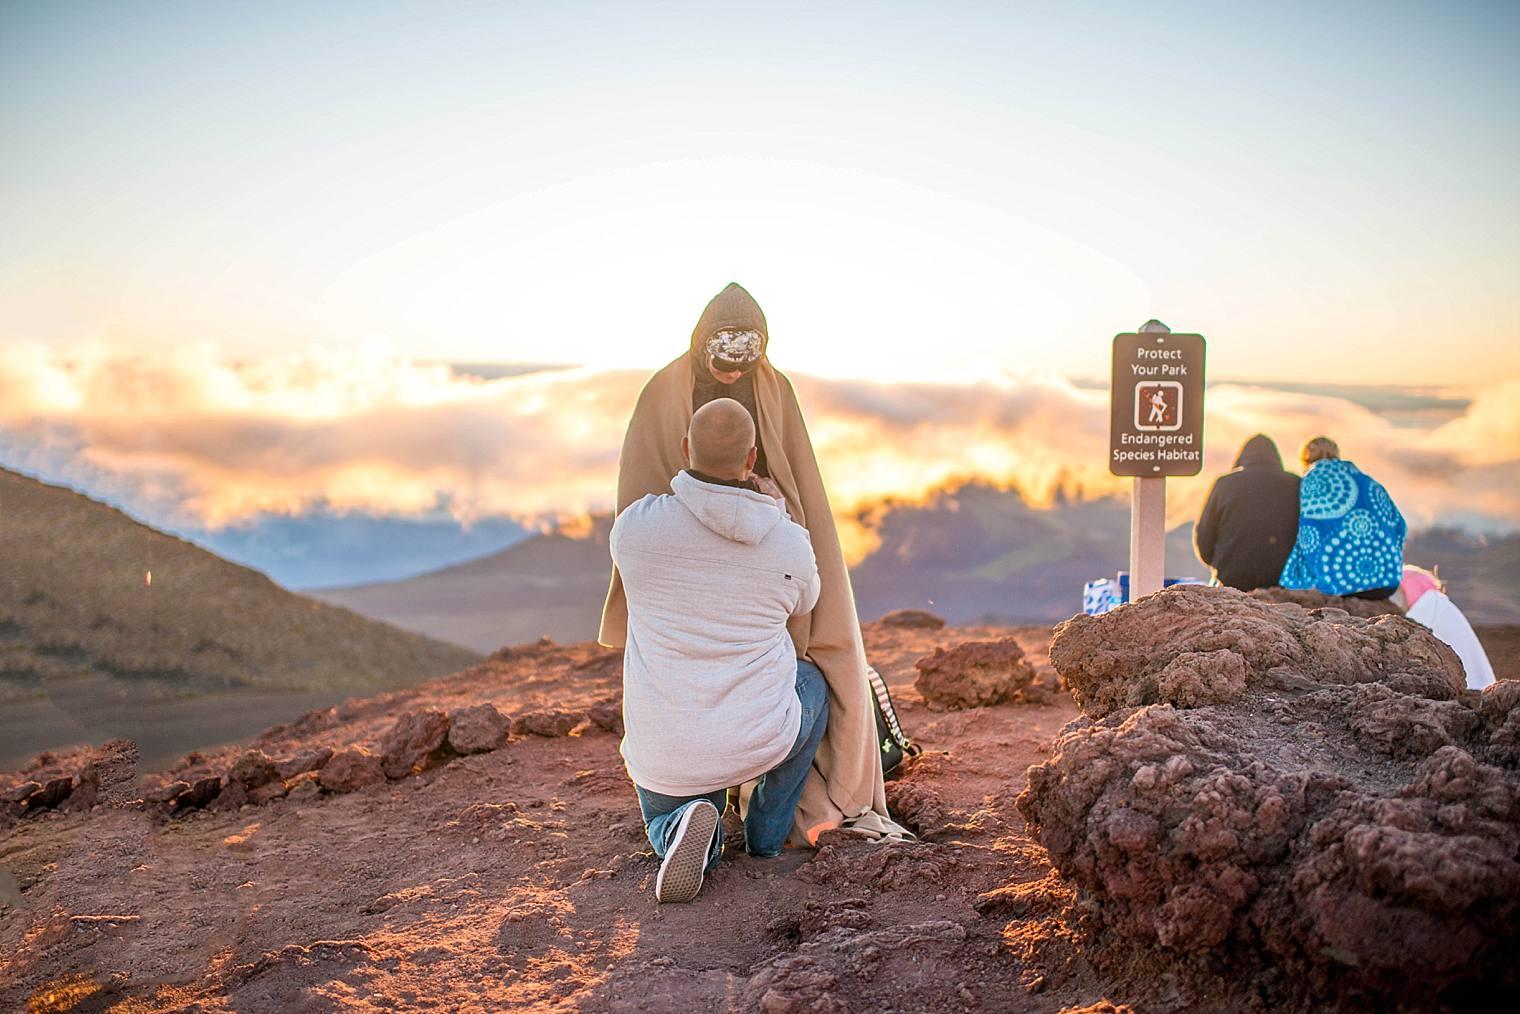 Jason + Darci  | Sunrise Proposal on Maui's Dormant Volcano